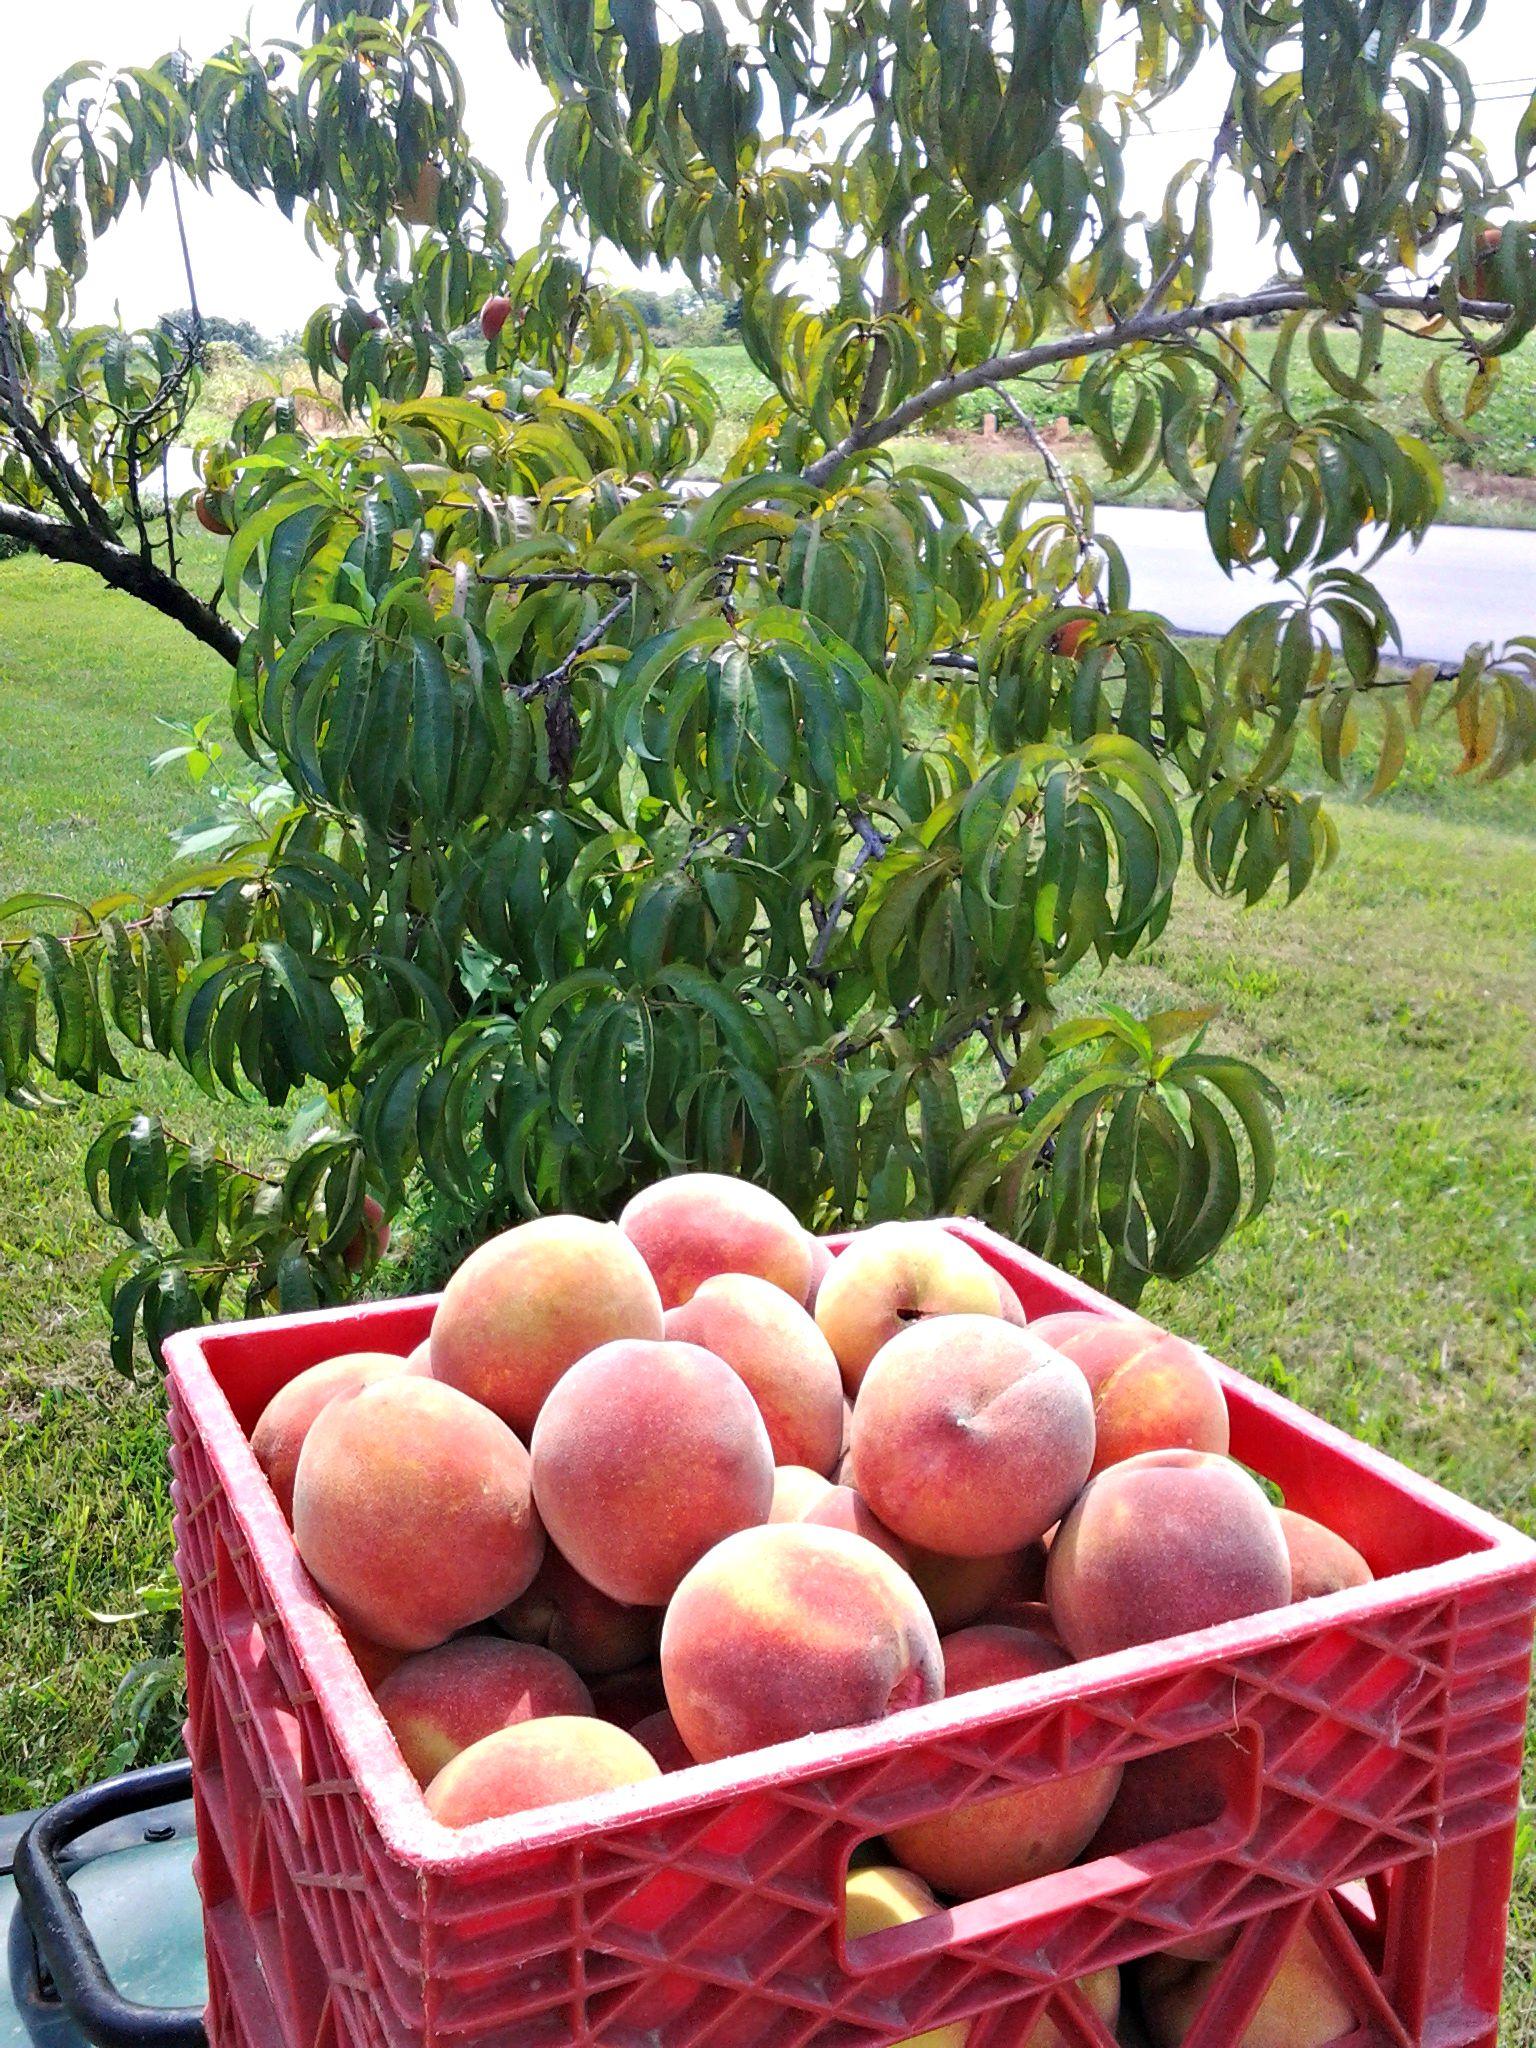 Canned Peach Spice Jam